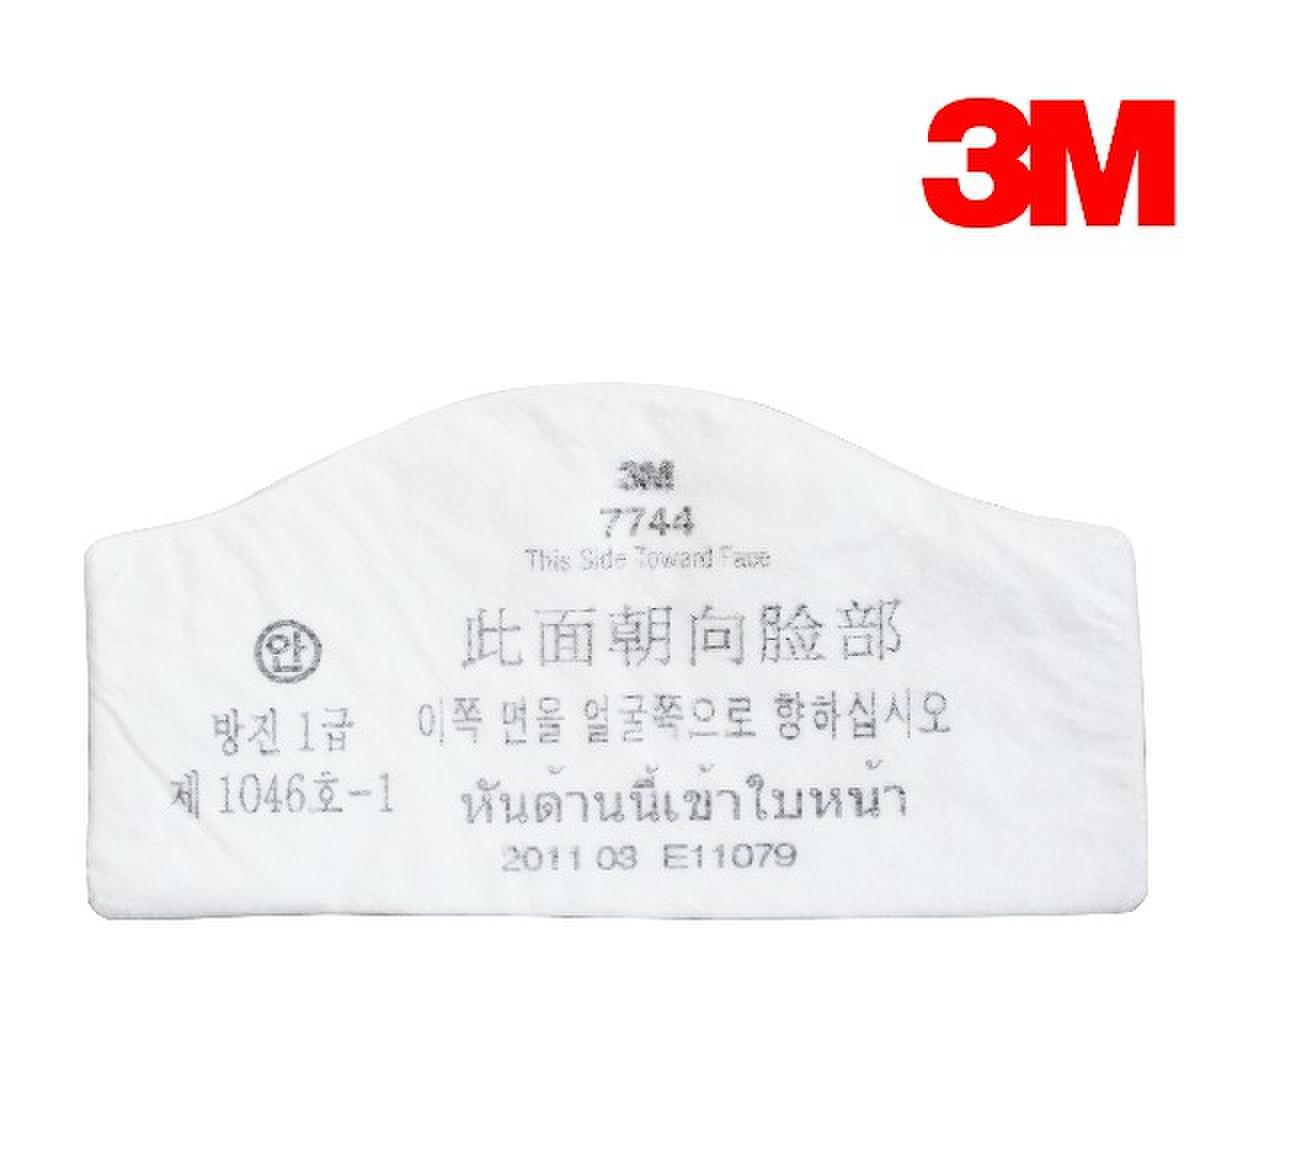 3M7744防尘滤棉颗粒物过滤棉3M7744滤芯3M7744滤片3M7744滤棉批发